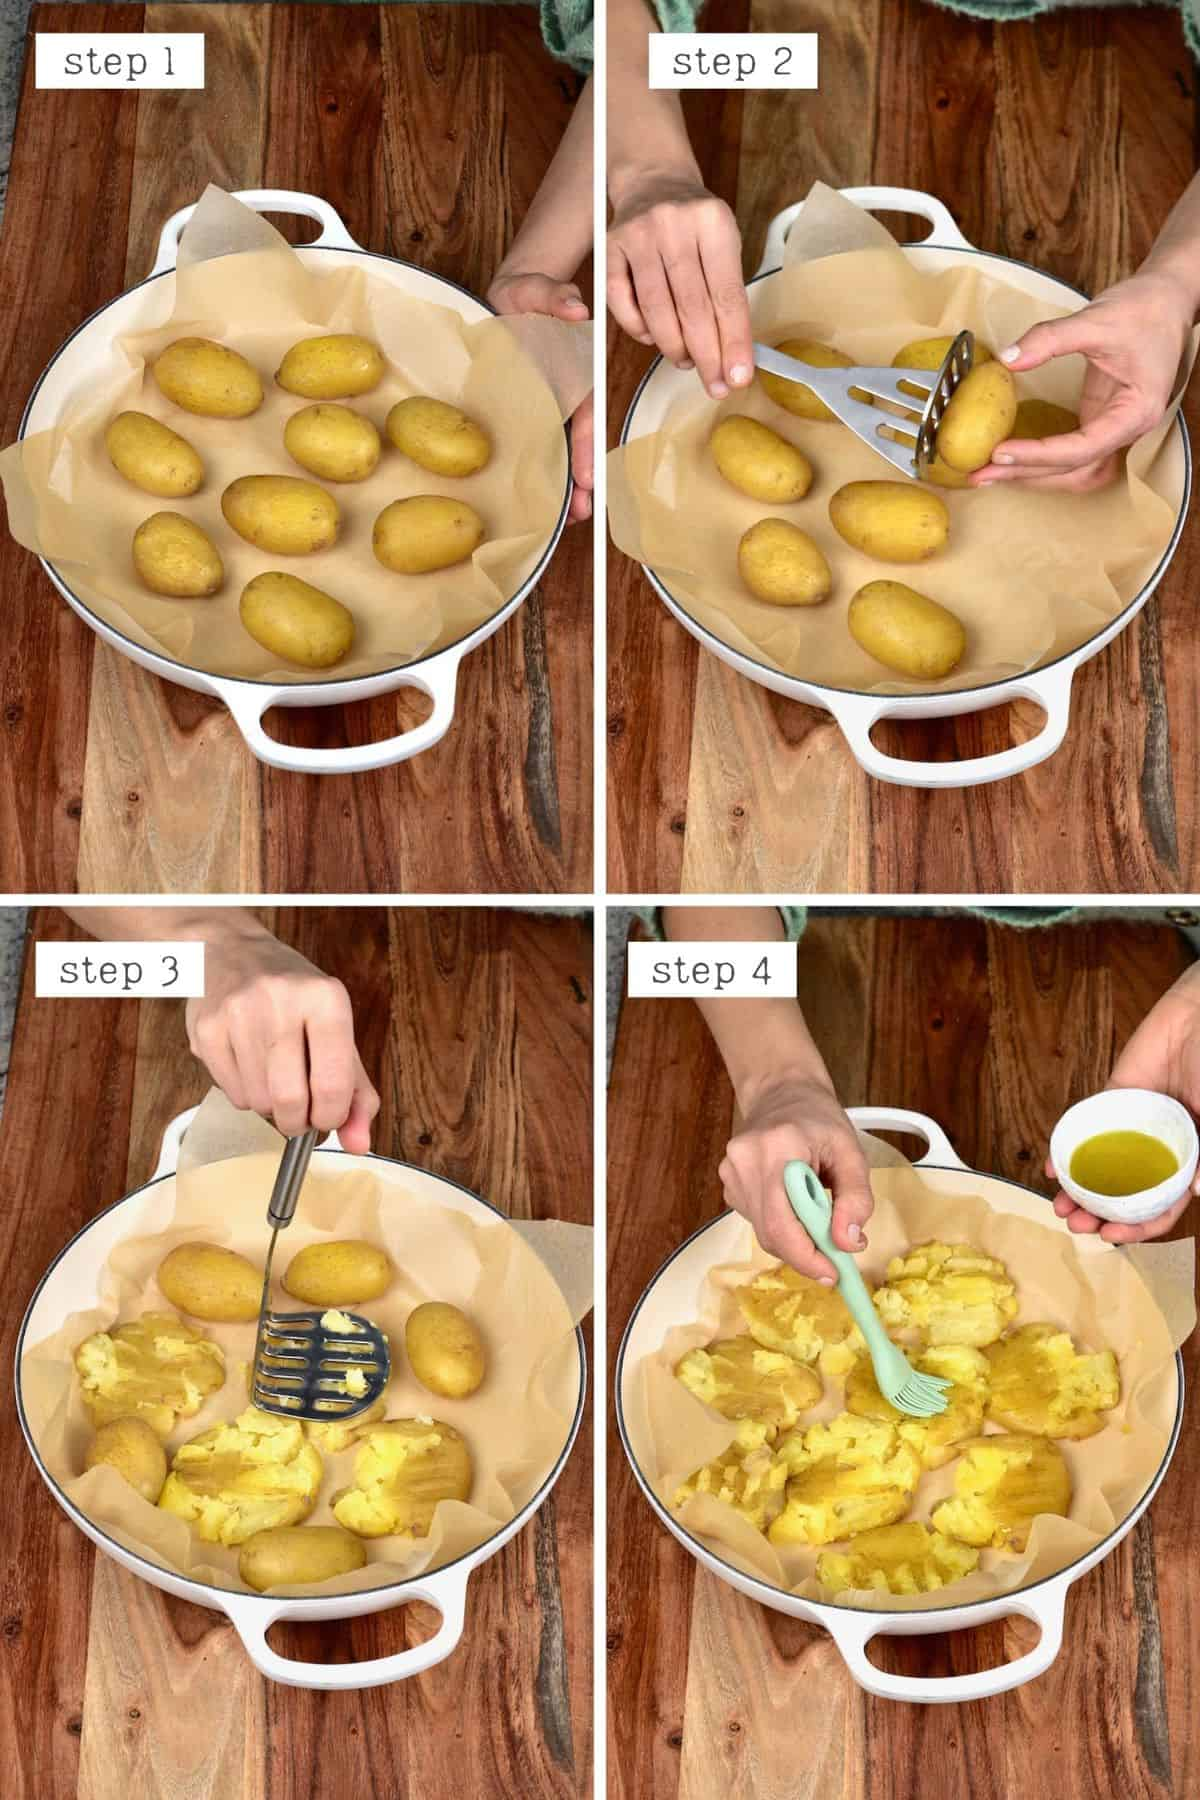 Smashing boiled potatoes and adding oil